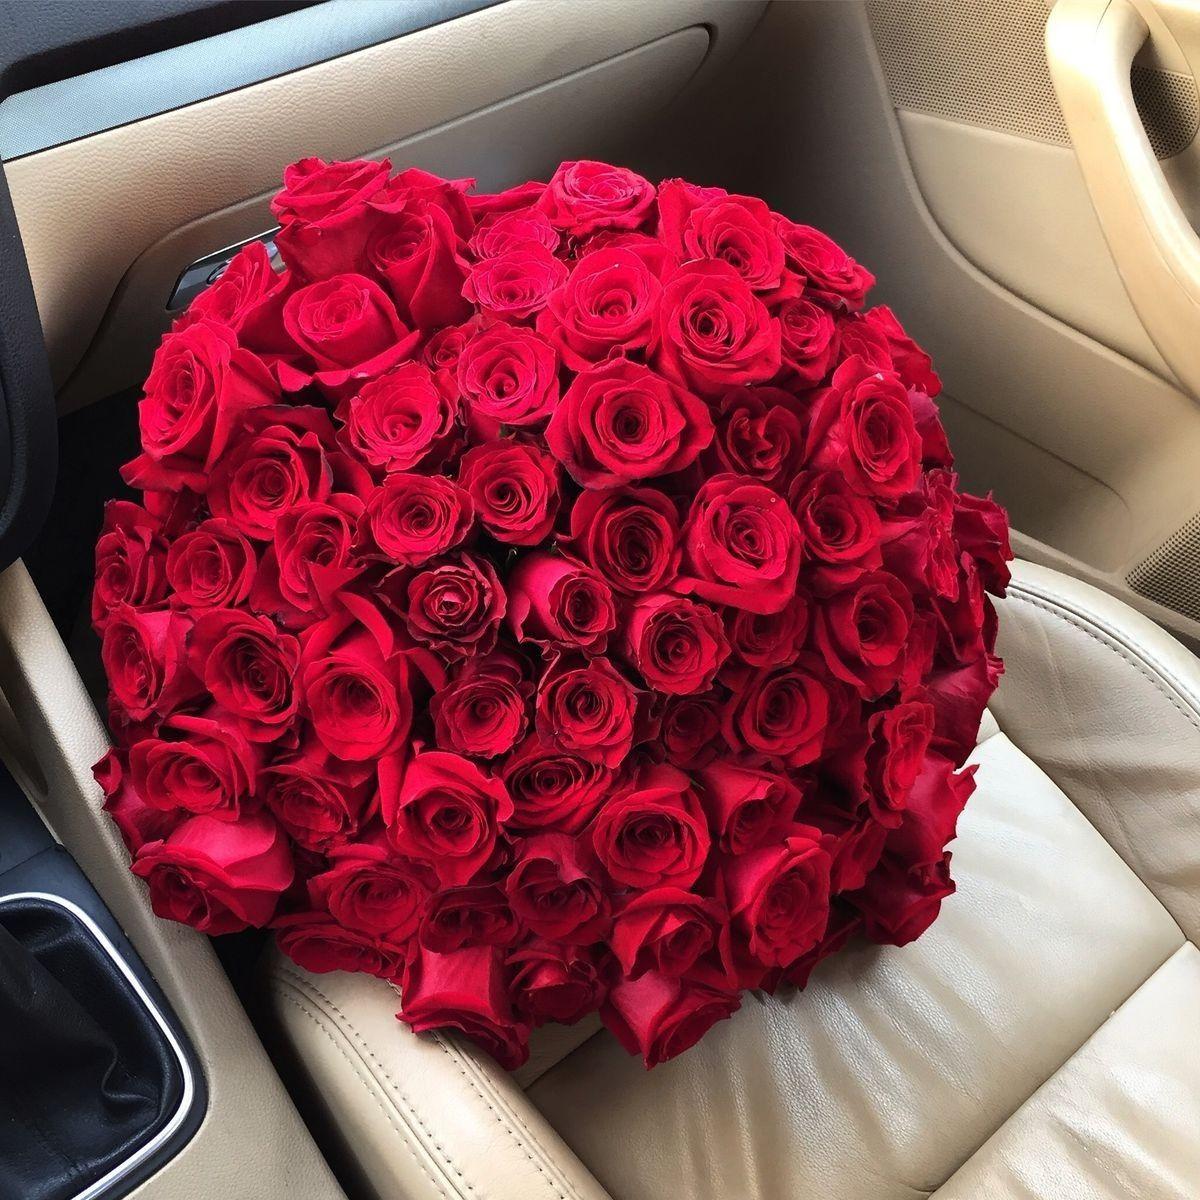 Pin By Leyla On عشاق الورد Red Rose Bouquet Luxury Flowers Flower Business